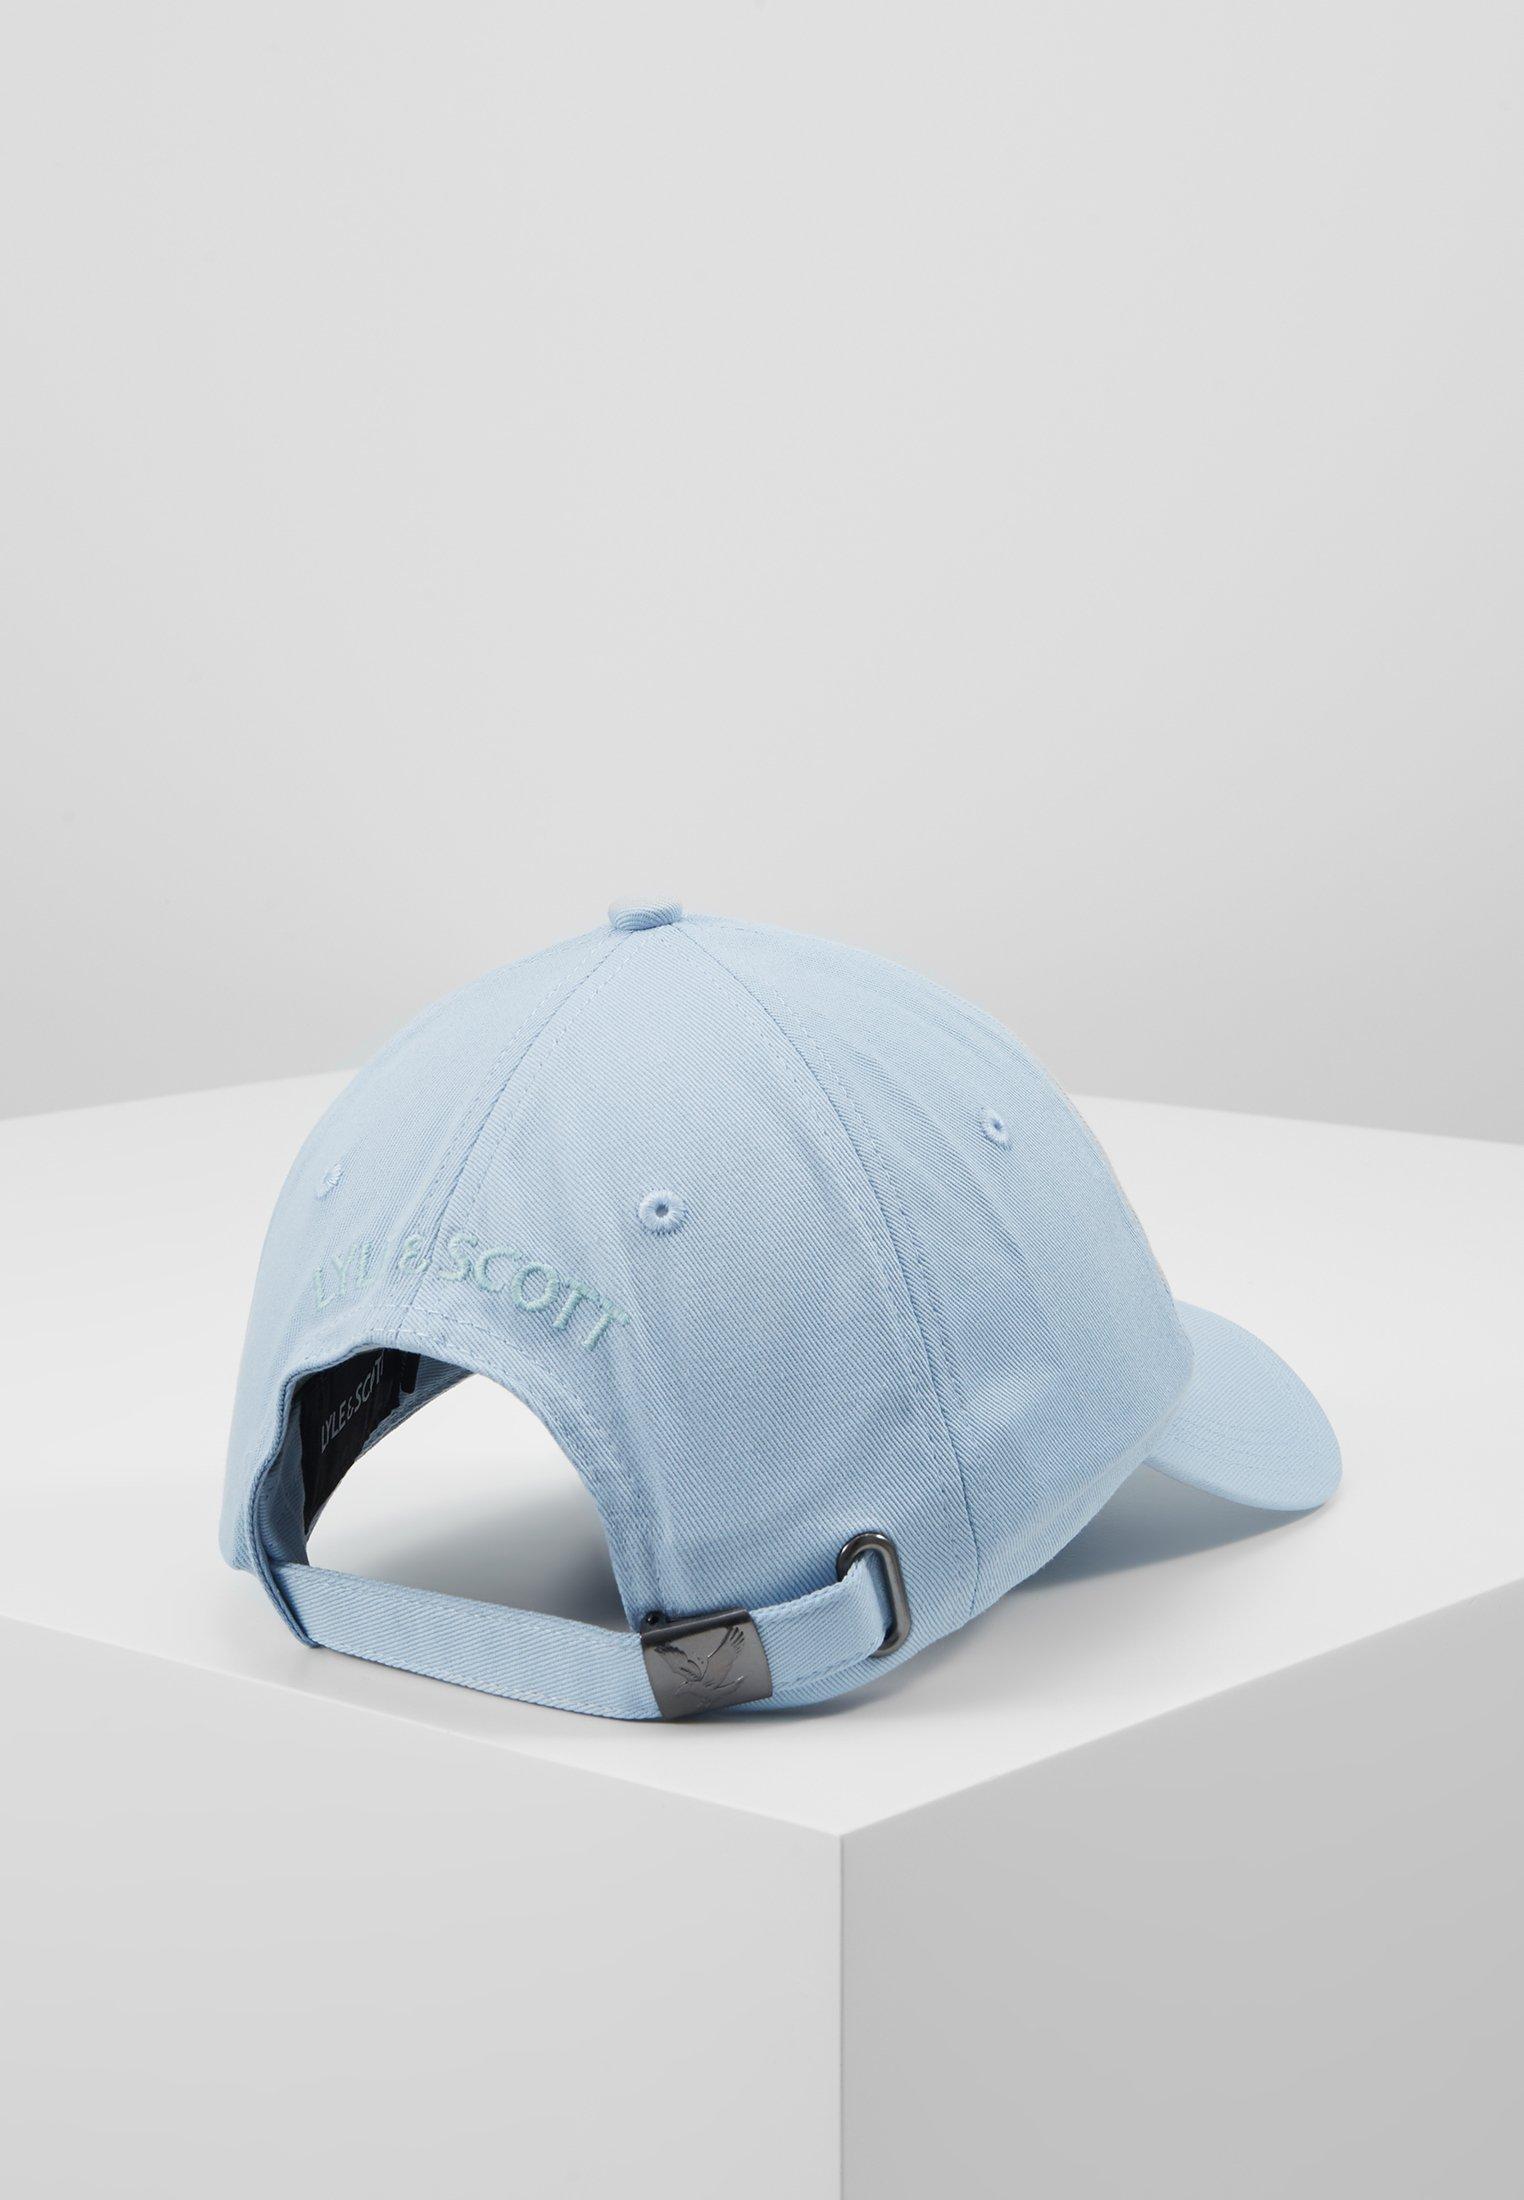 Lyle & Scott BASEBALL - Cap - pool blue/blå uS3NzNuL9qgGgxR